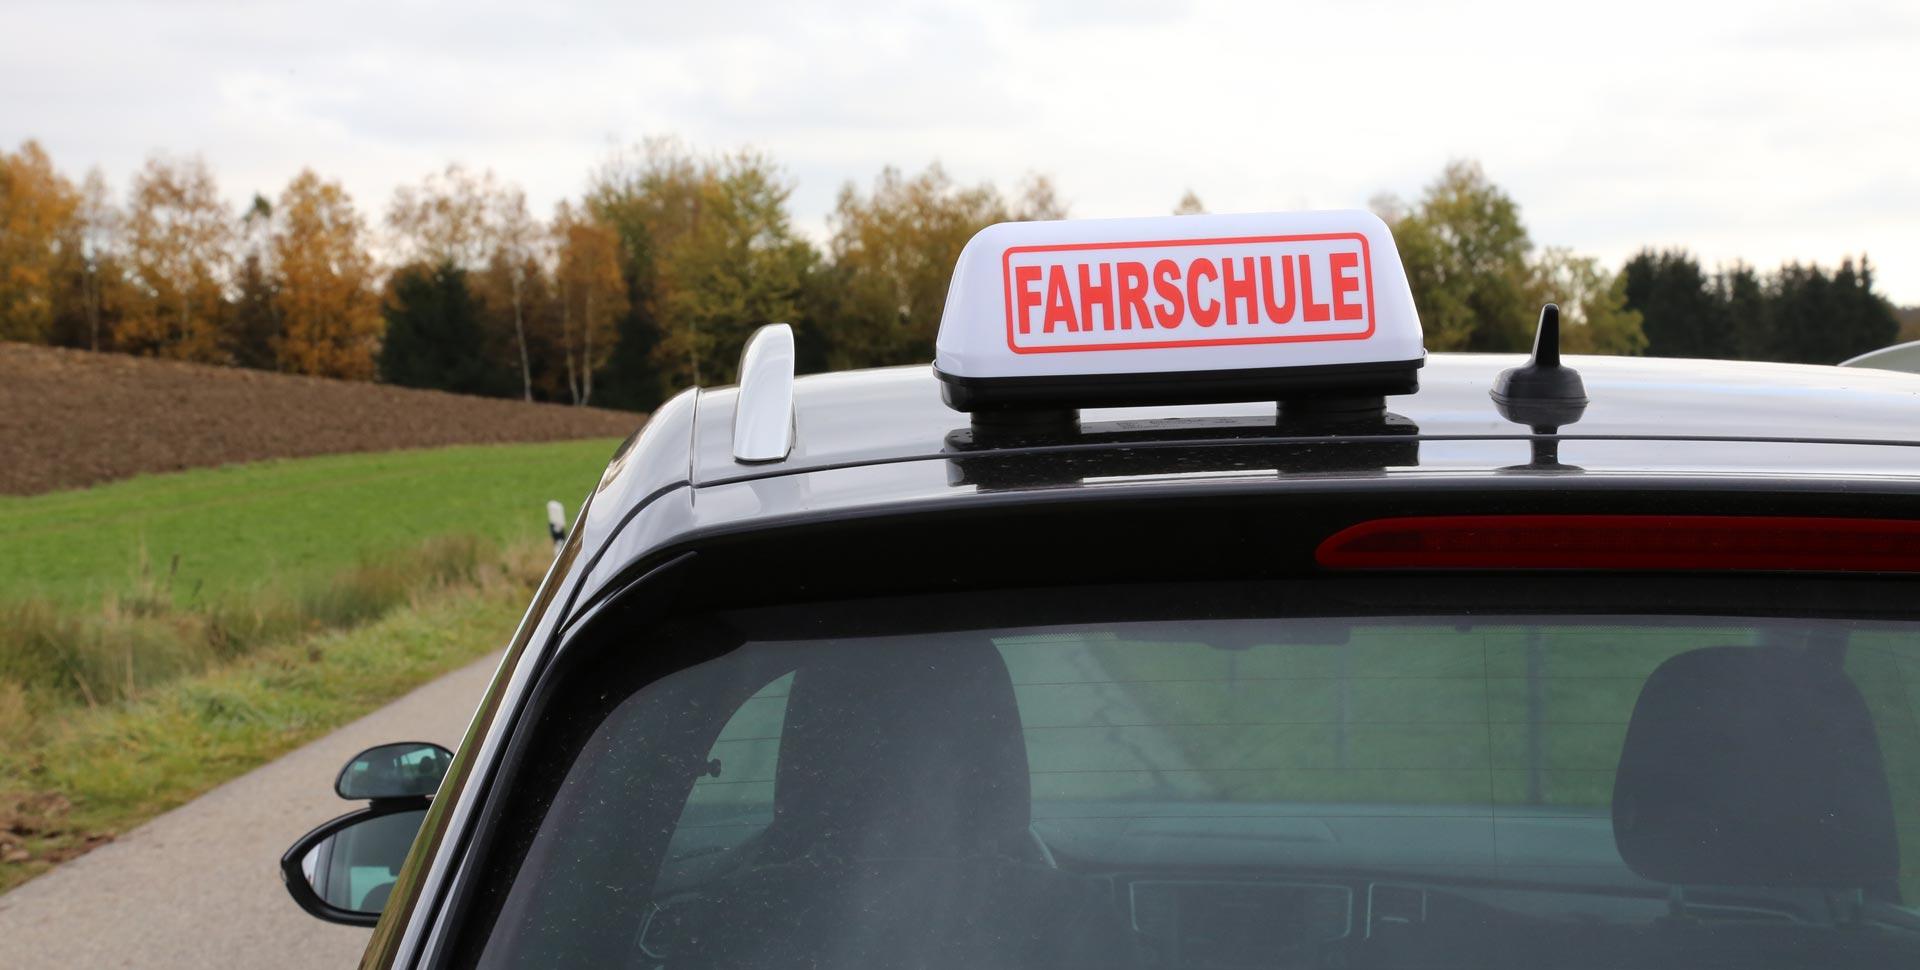 Fahrschulauto von Fahrschule Schulz